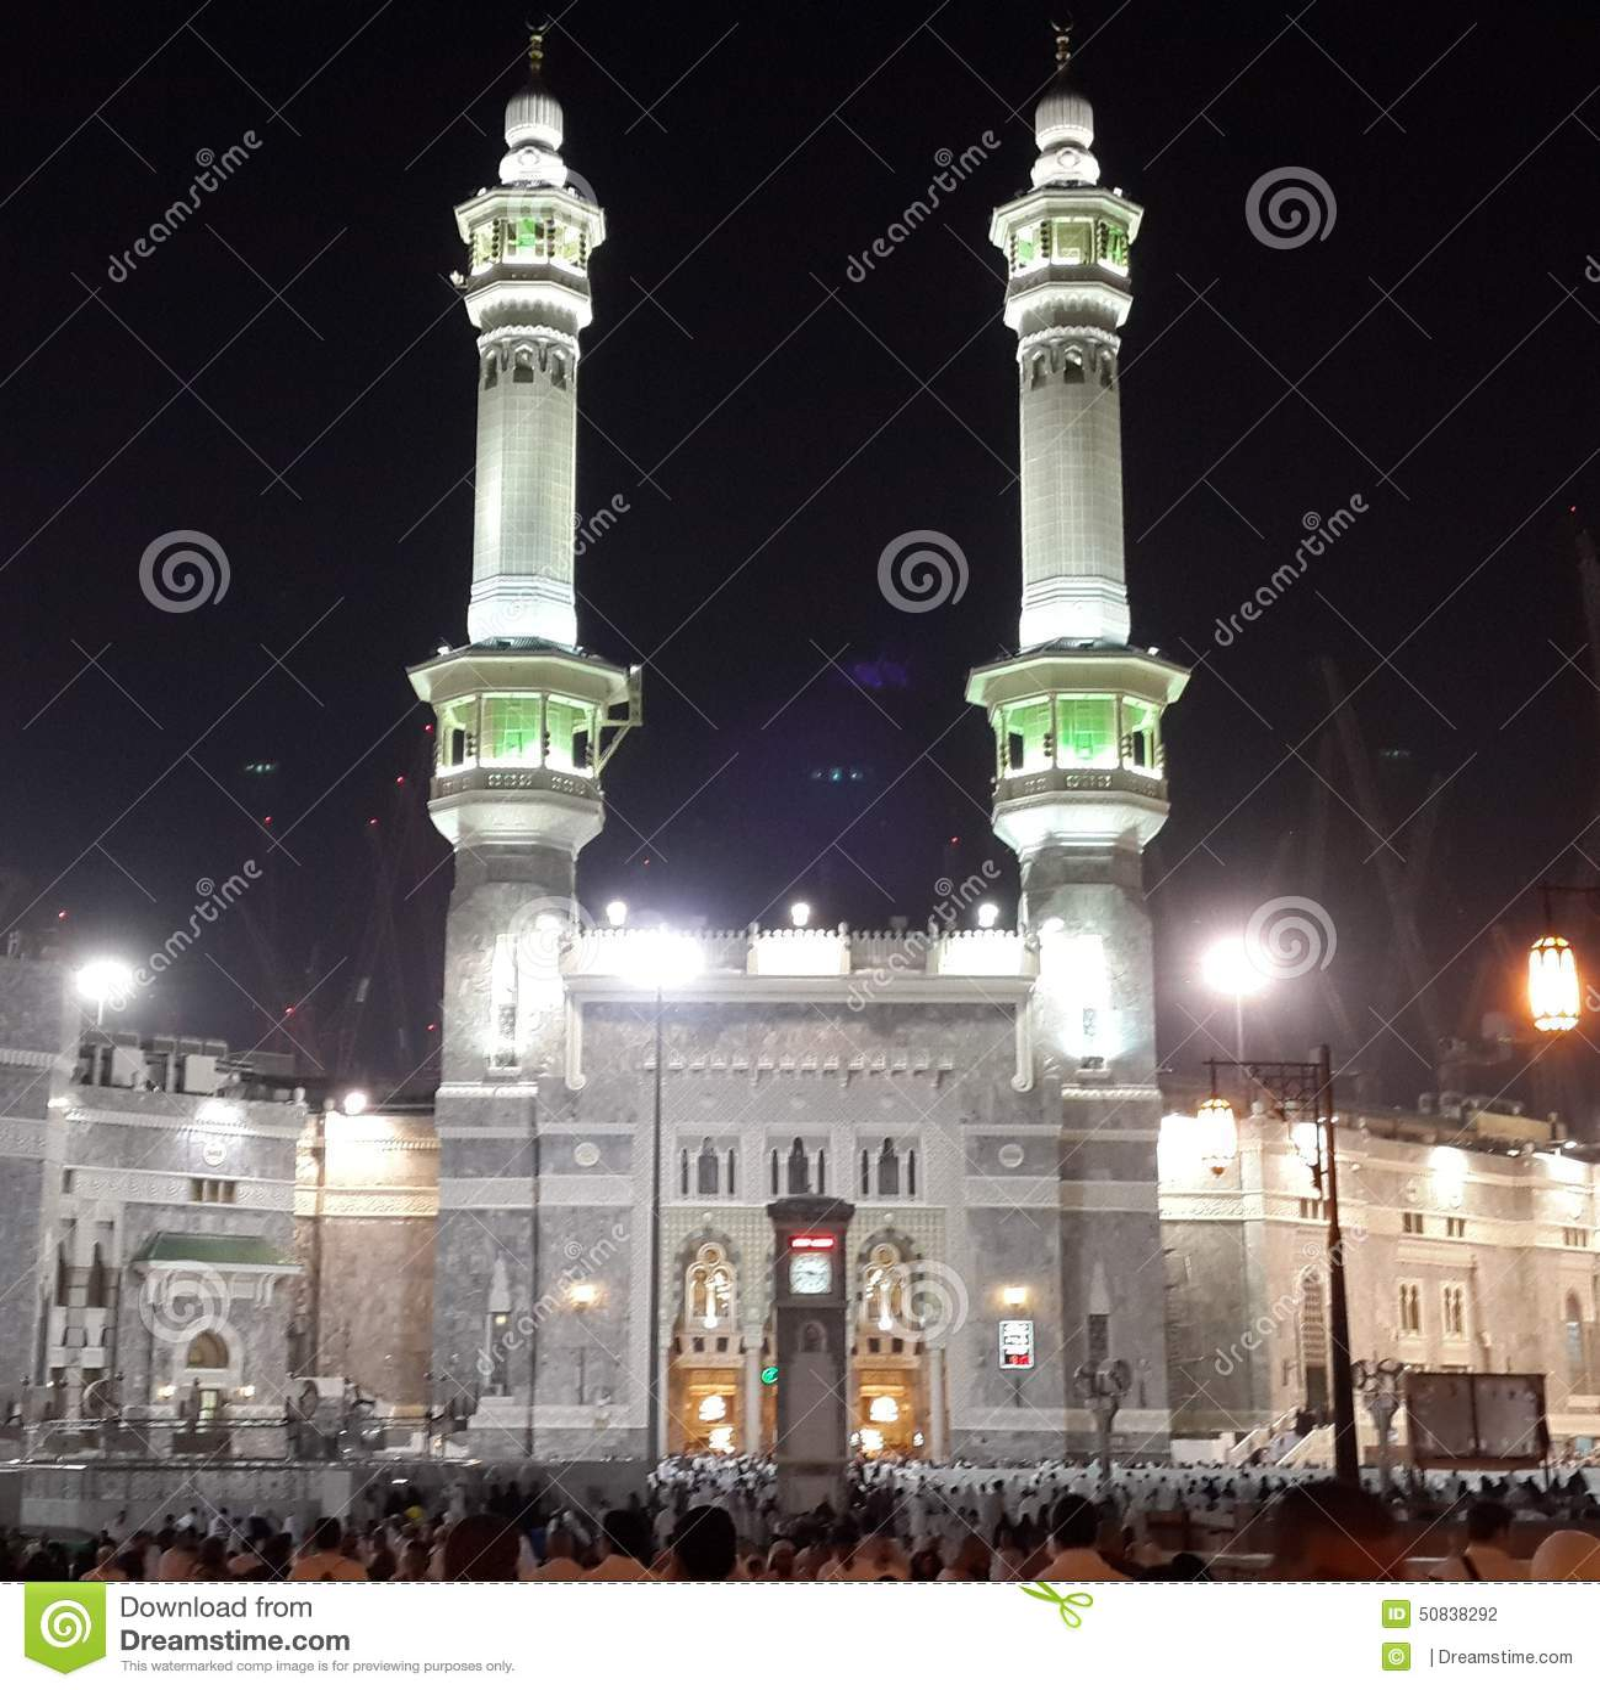 masjidil haram stock photo image of place kiblat kaaba 50838292